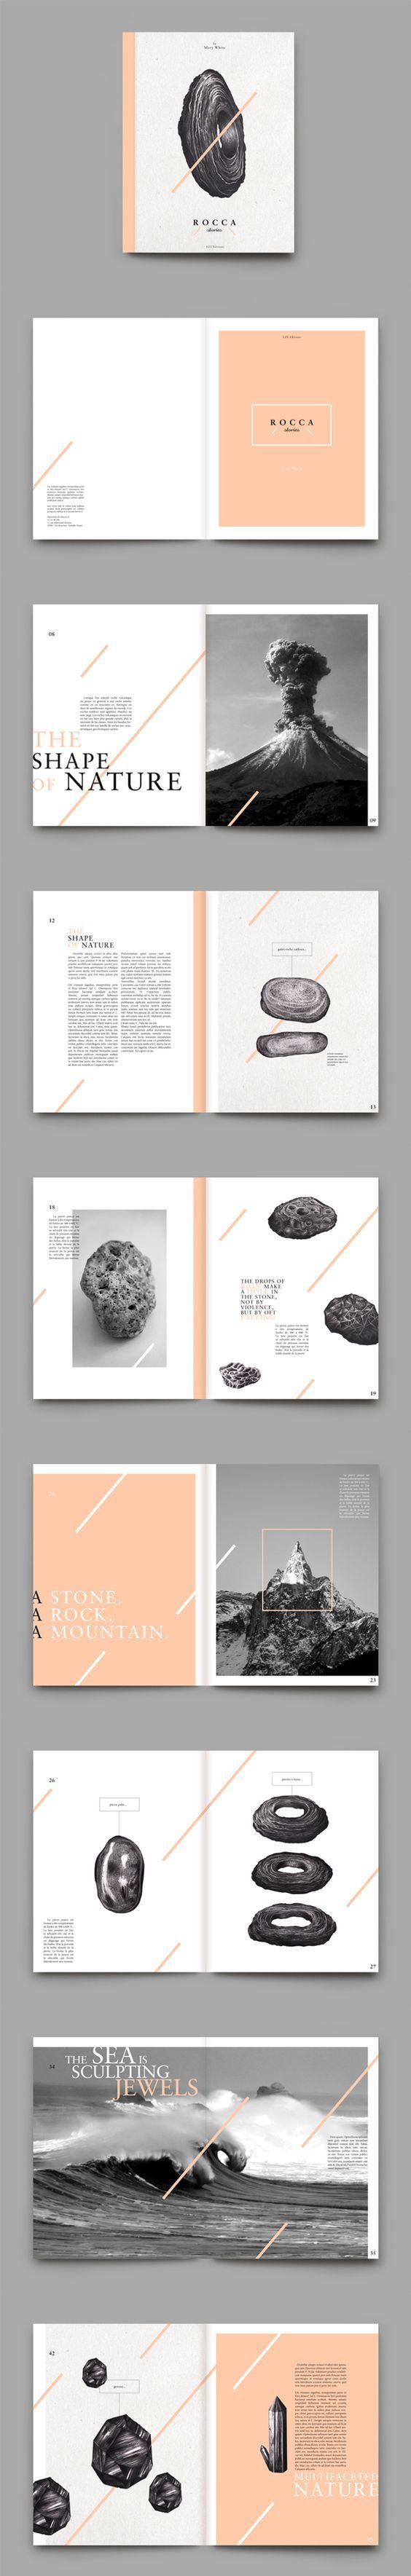 R O C C A stories / magazine layout design Bárbaro, Á., n.d., 'Diseño editorial', Pinterest, viewed 16 August 2015, <https://www.pinterest.com/alvarobarbaro/dise%C3%B1o-editorial></https:>: